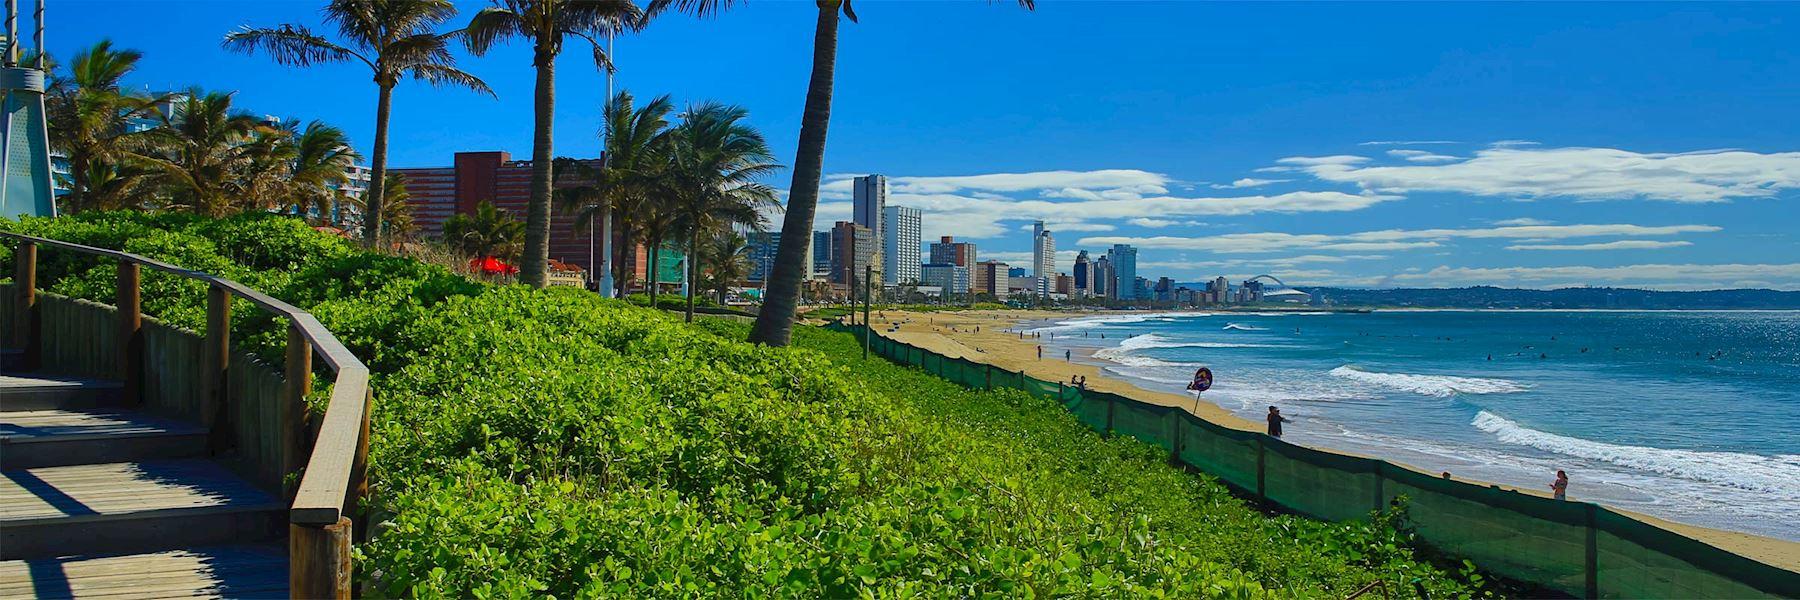 Visit Durban, South Africa